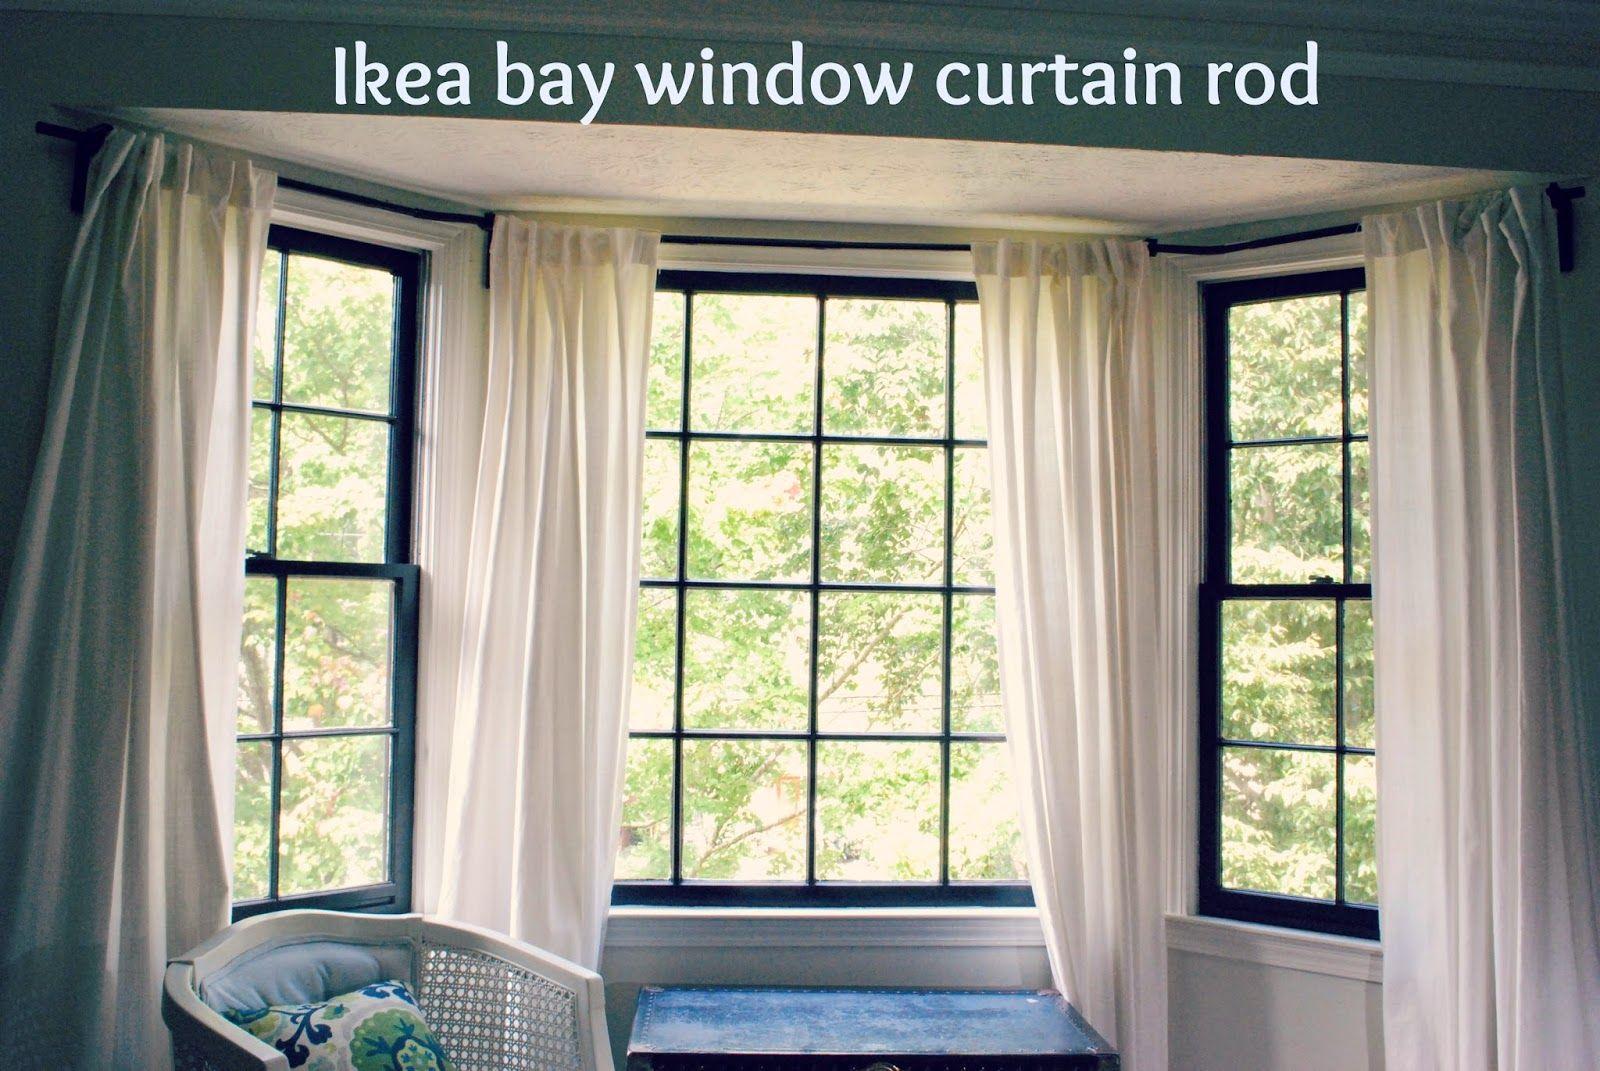 7 Easy Ways Utilise Bay Windows Ideas That Make A Beautiful